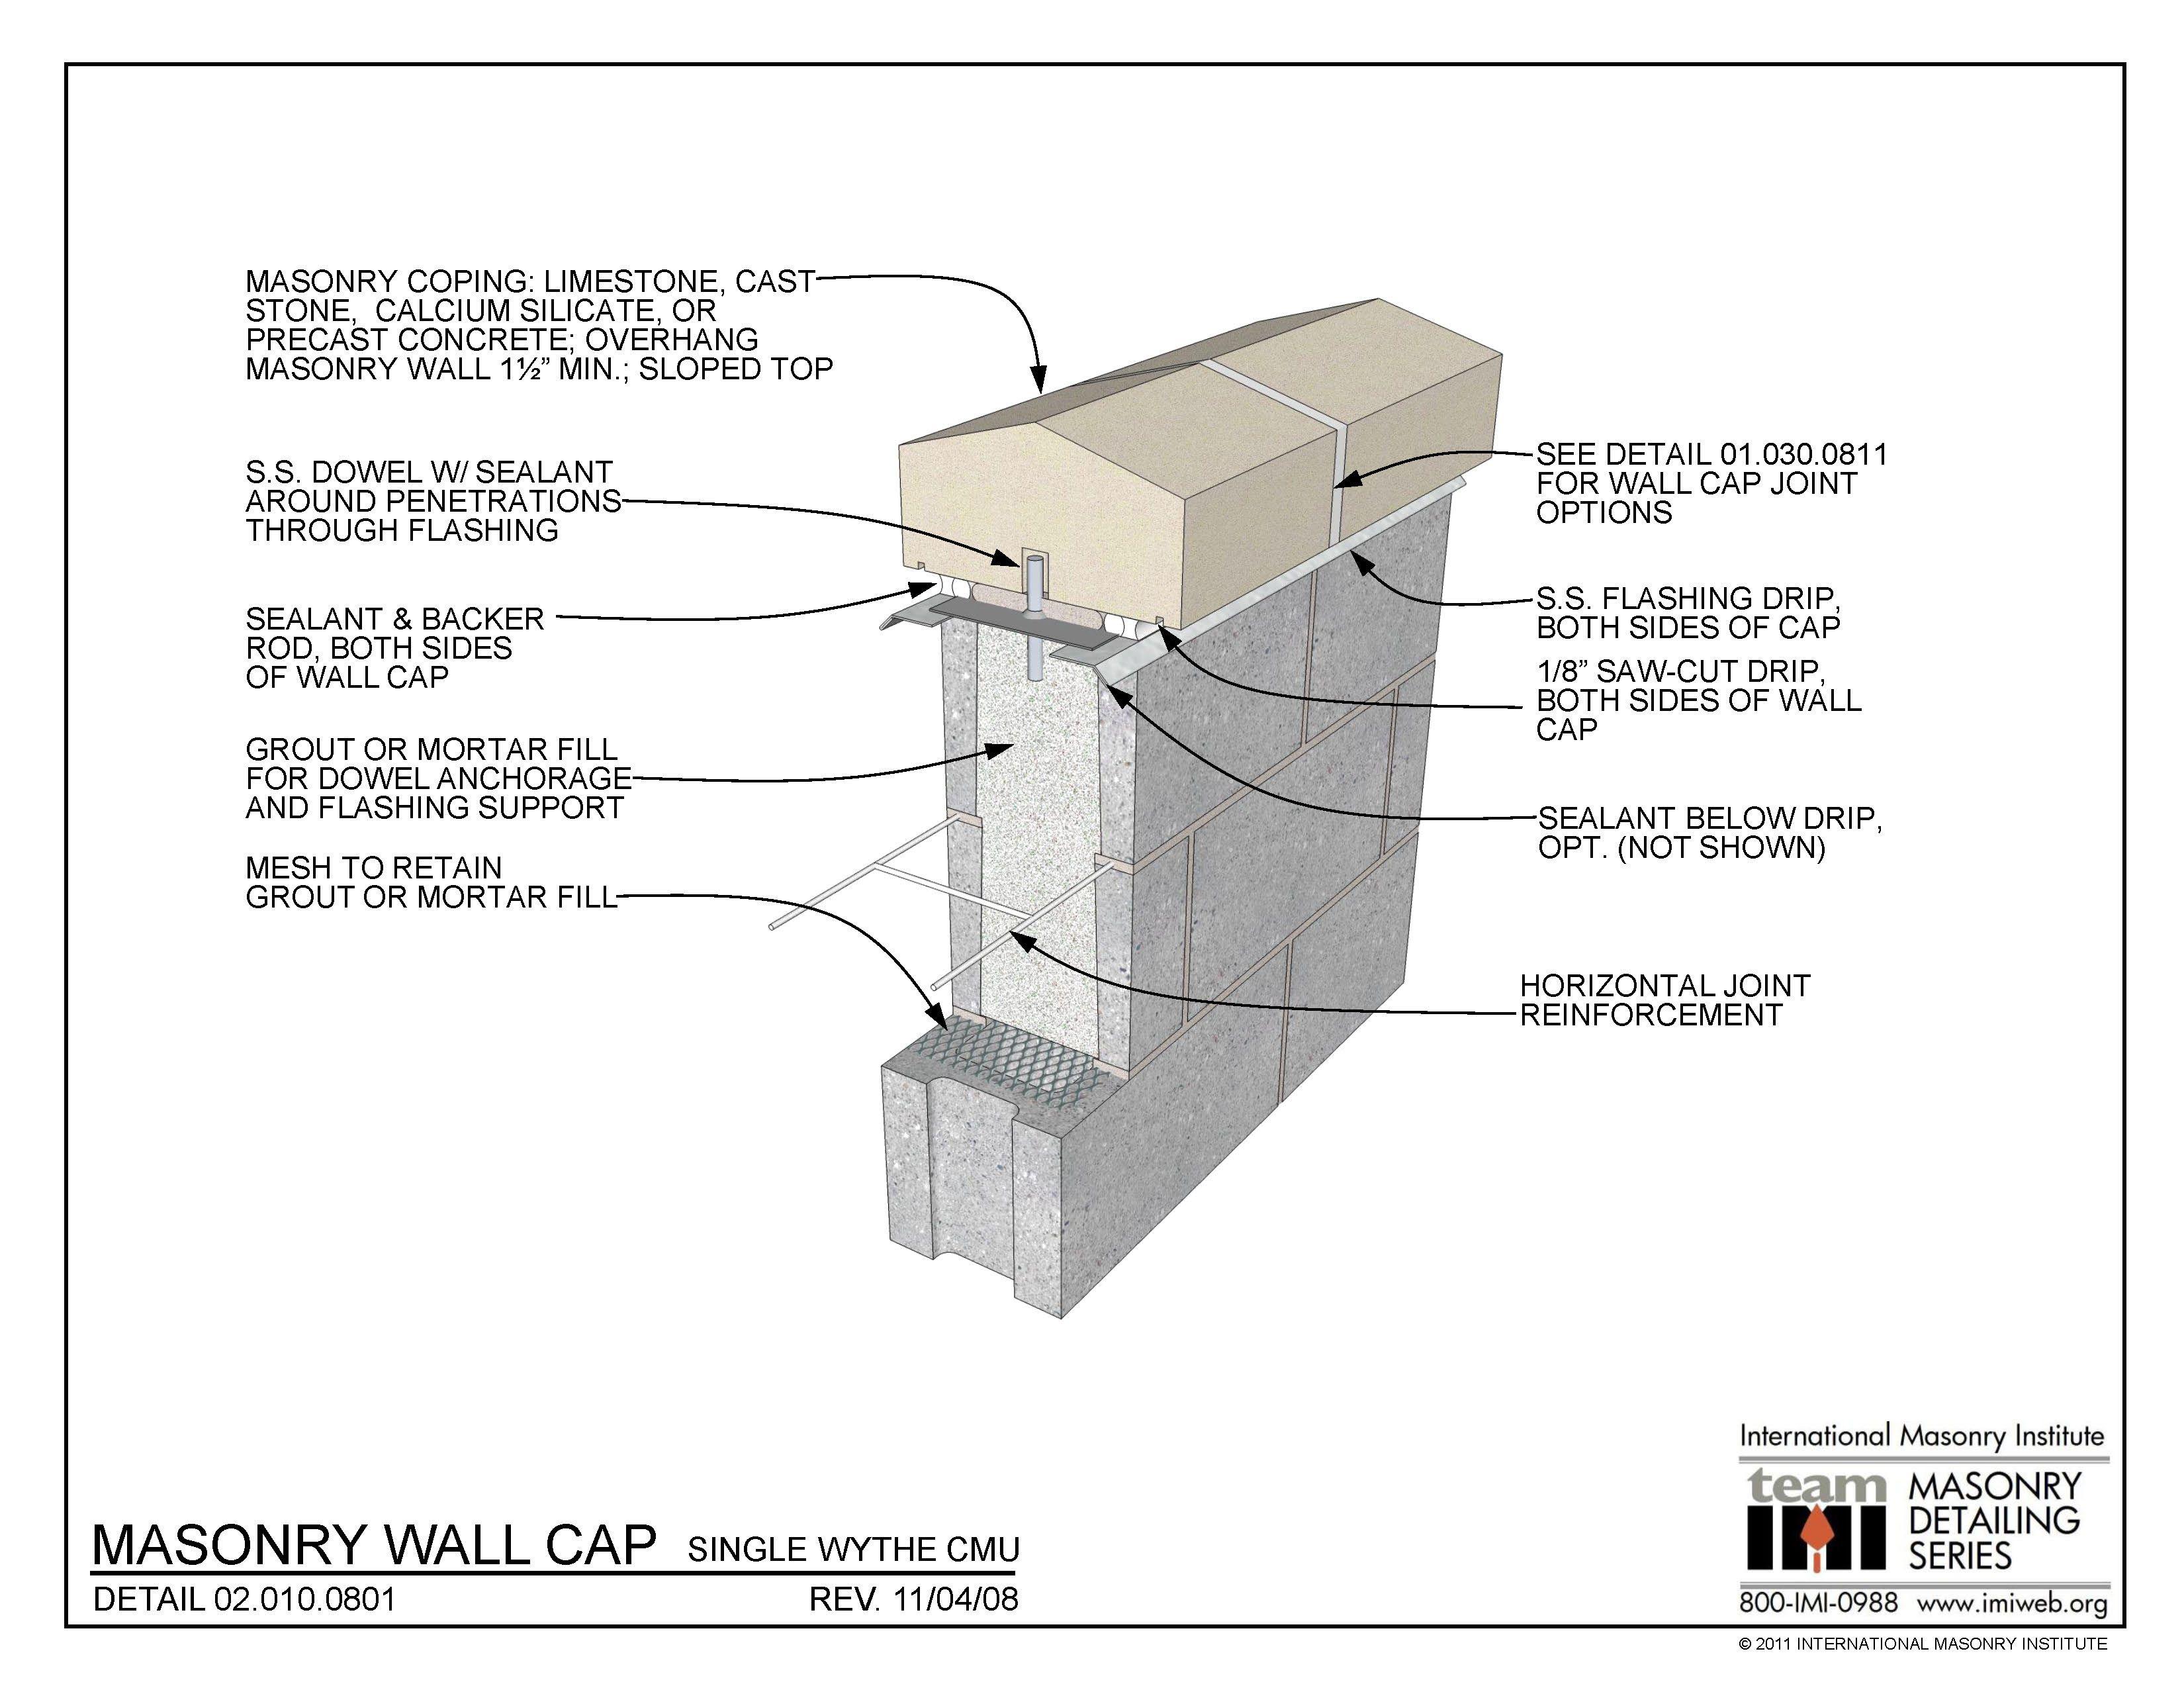 02.010.0801: Masonry Wall Cap - Single Wythe CMU ...